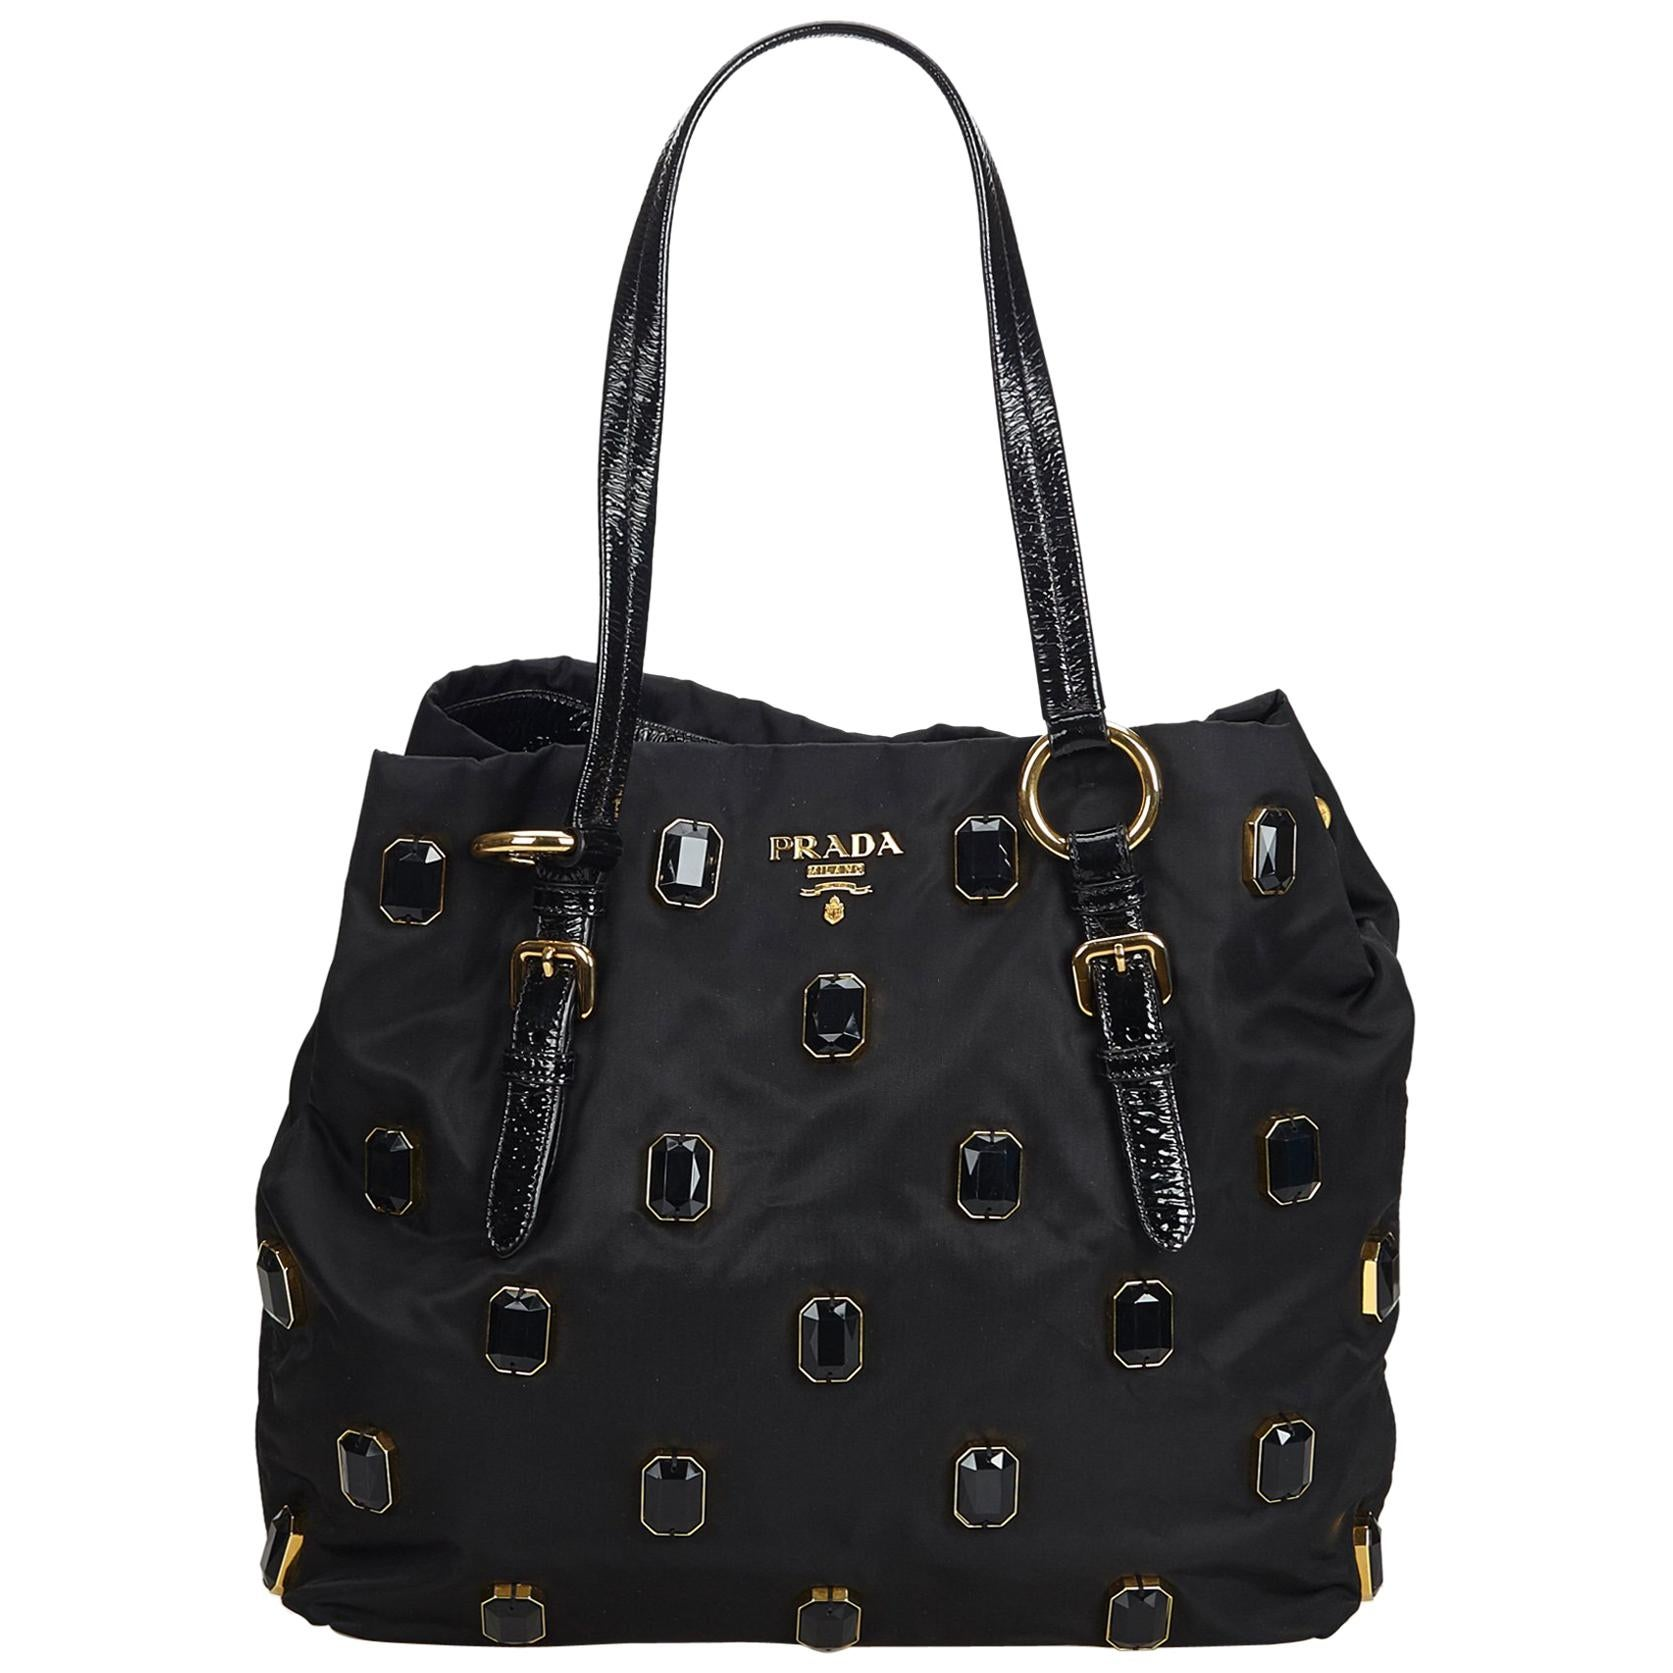 3c4c9ae0ea886b Prada Green Nylon Fabric Tessuto Pietre Tote Bag Italy w/ Dust Bag For Sale  at 1stdibs